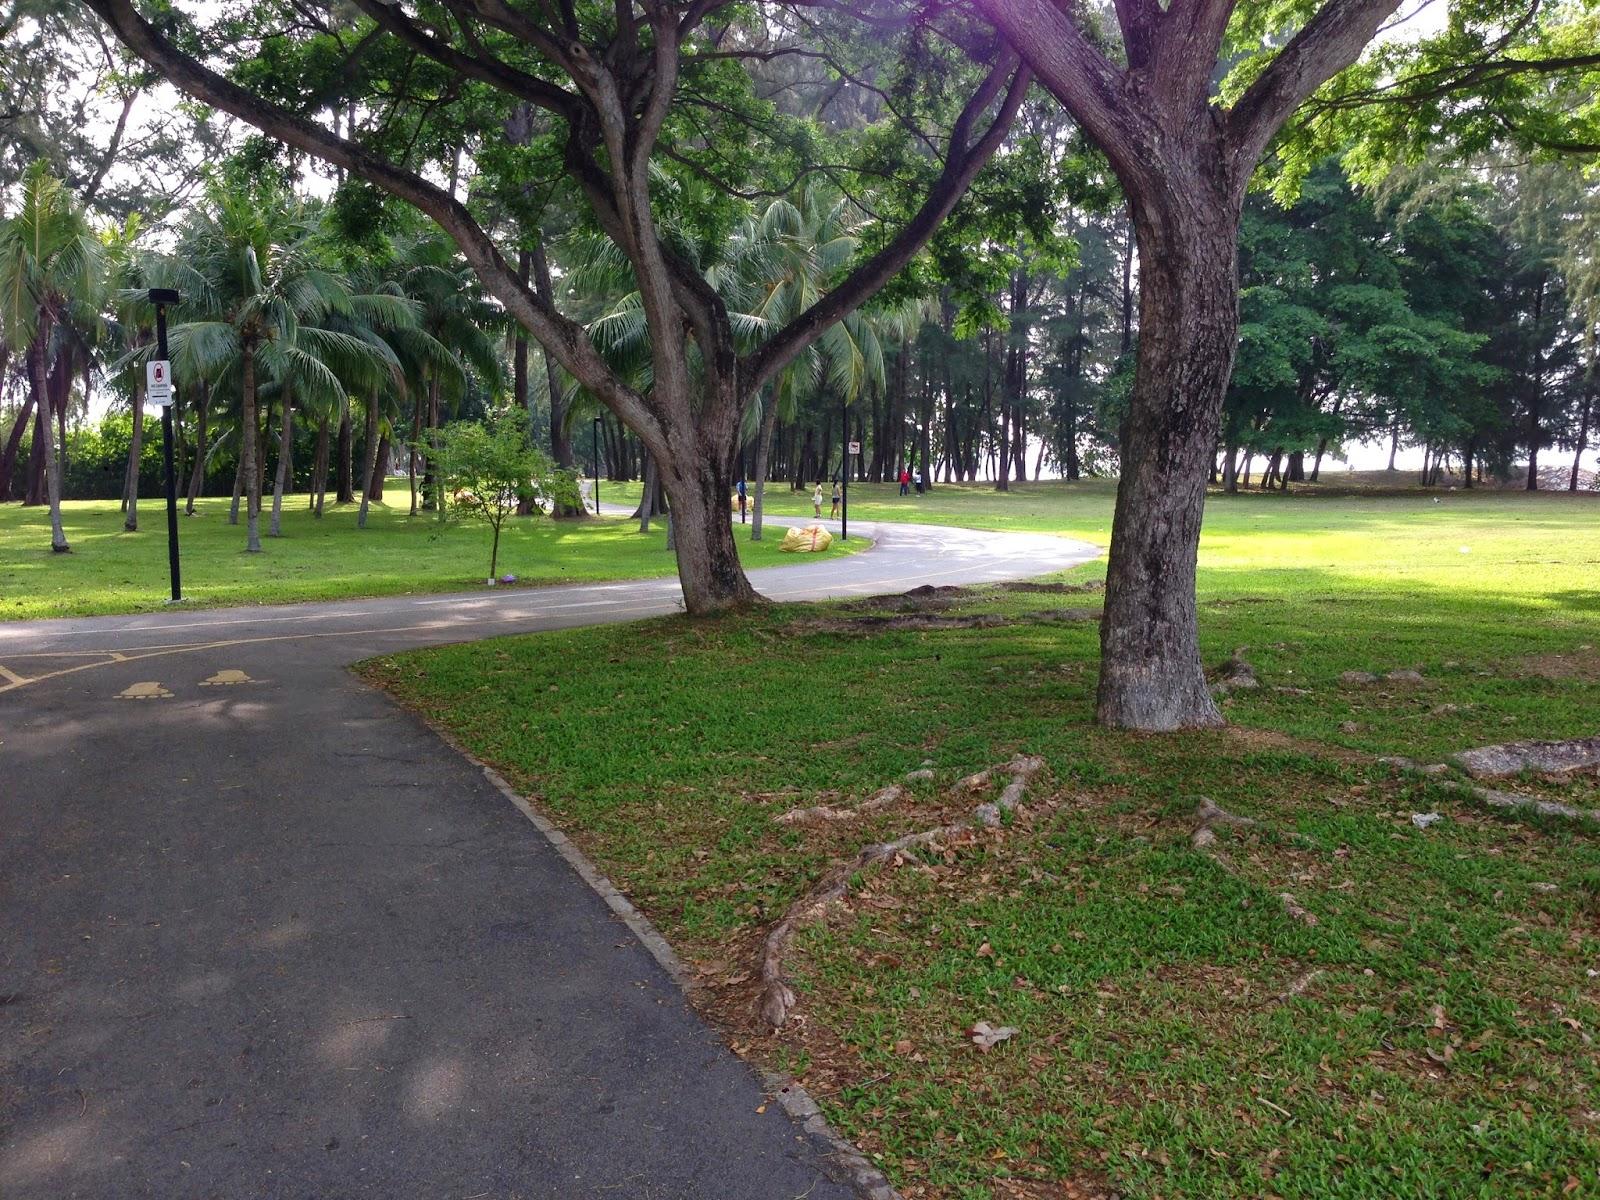 Marina Bay/ Gardens by the Bay - 8km / 11km Loop | Singapore Run. Can.